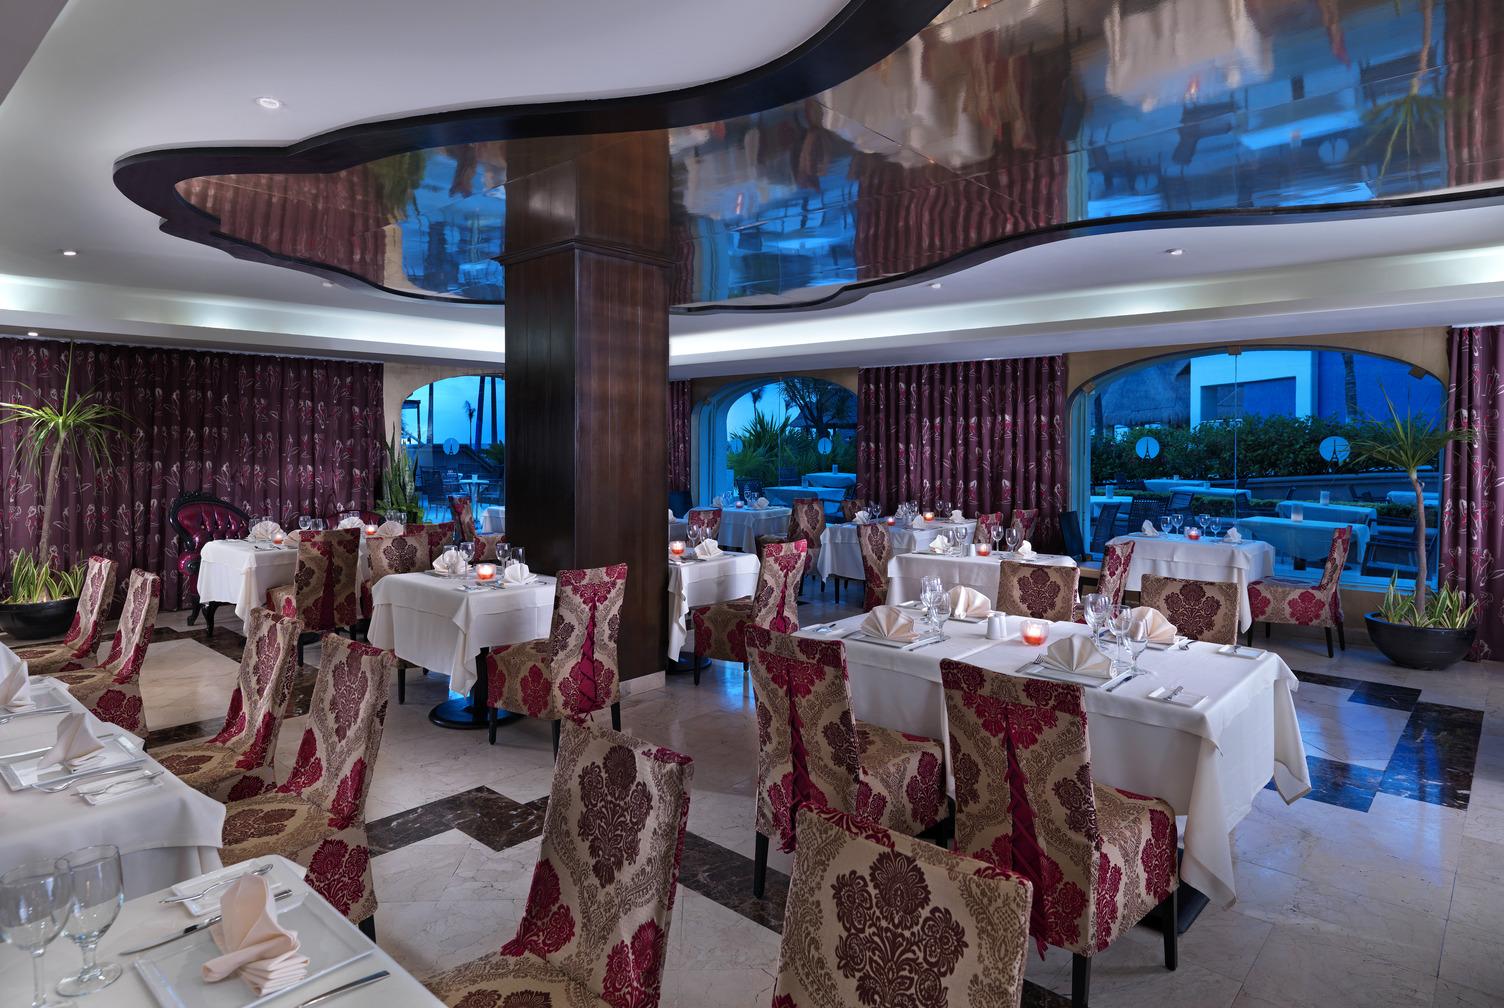 Travel Agency All-Inclusive Resort Heaven at Hard Rock Hotel Riviera Maya 45